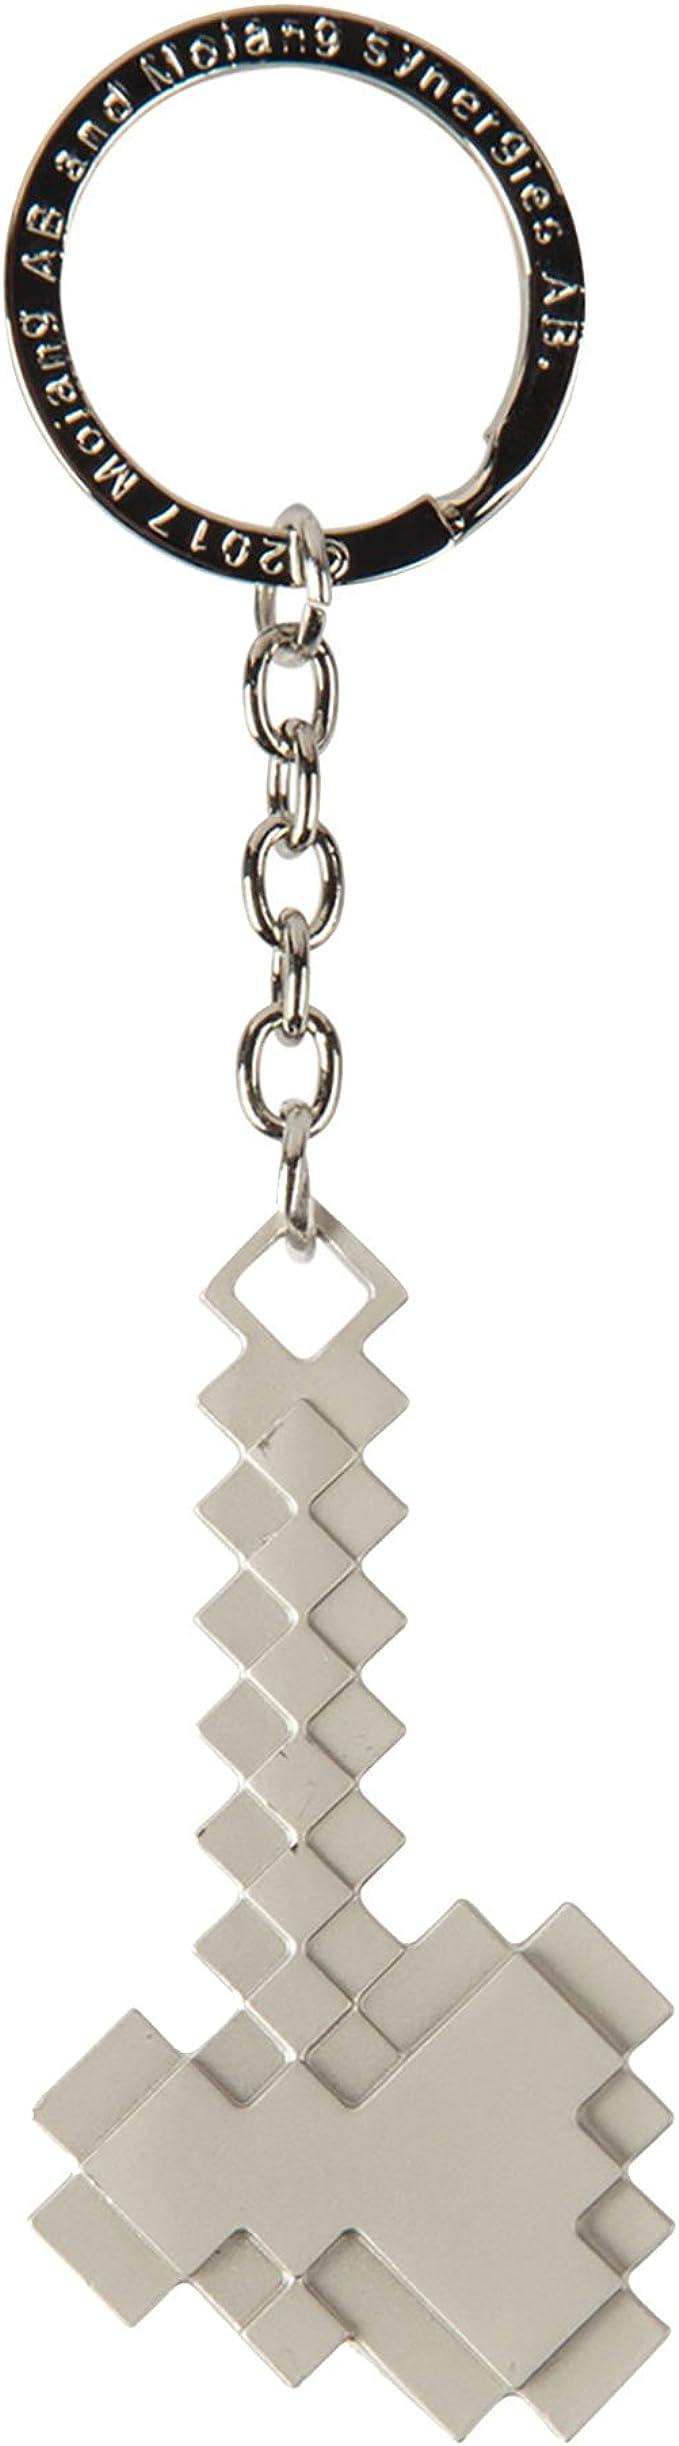 Amazon.com: JINX Minecraft Axe 11D Metal Key Chain, Metallic, One